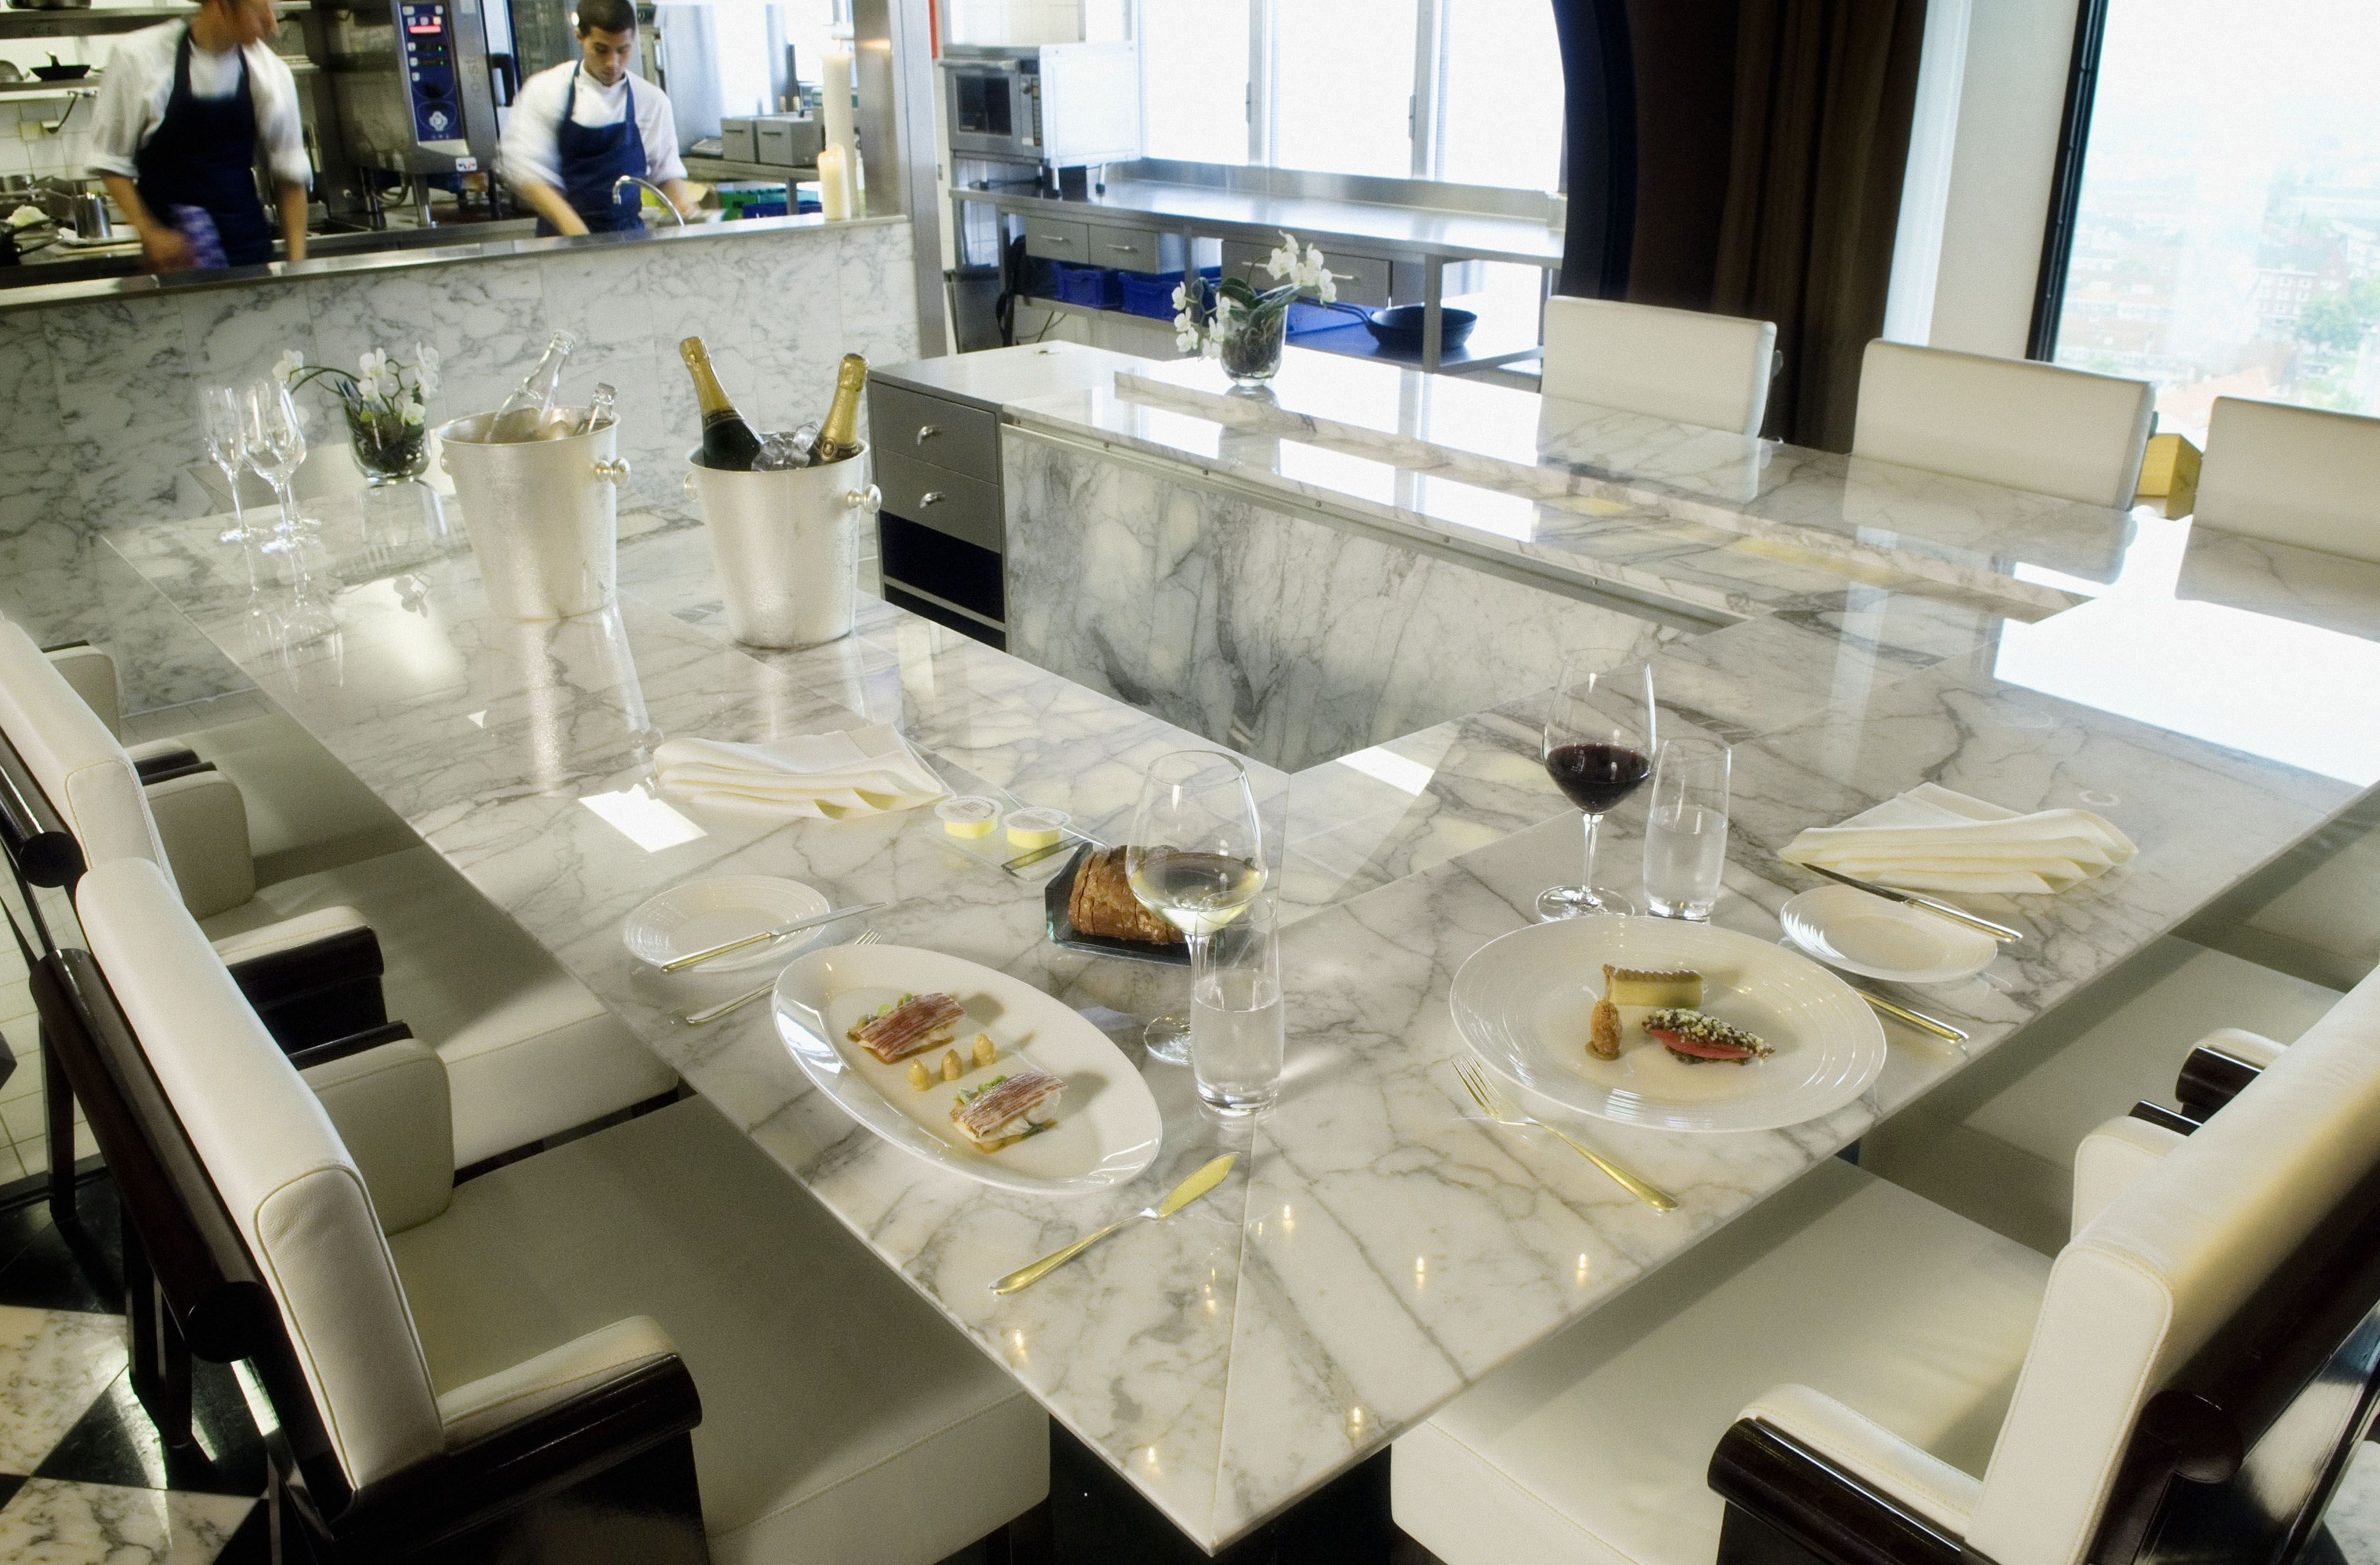 Chef S Table Ciel Bleu Restaurant Hotel Okura Amsterdam Top Hotelslow Cost